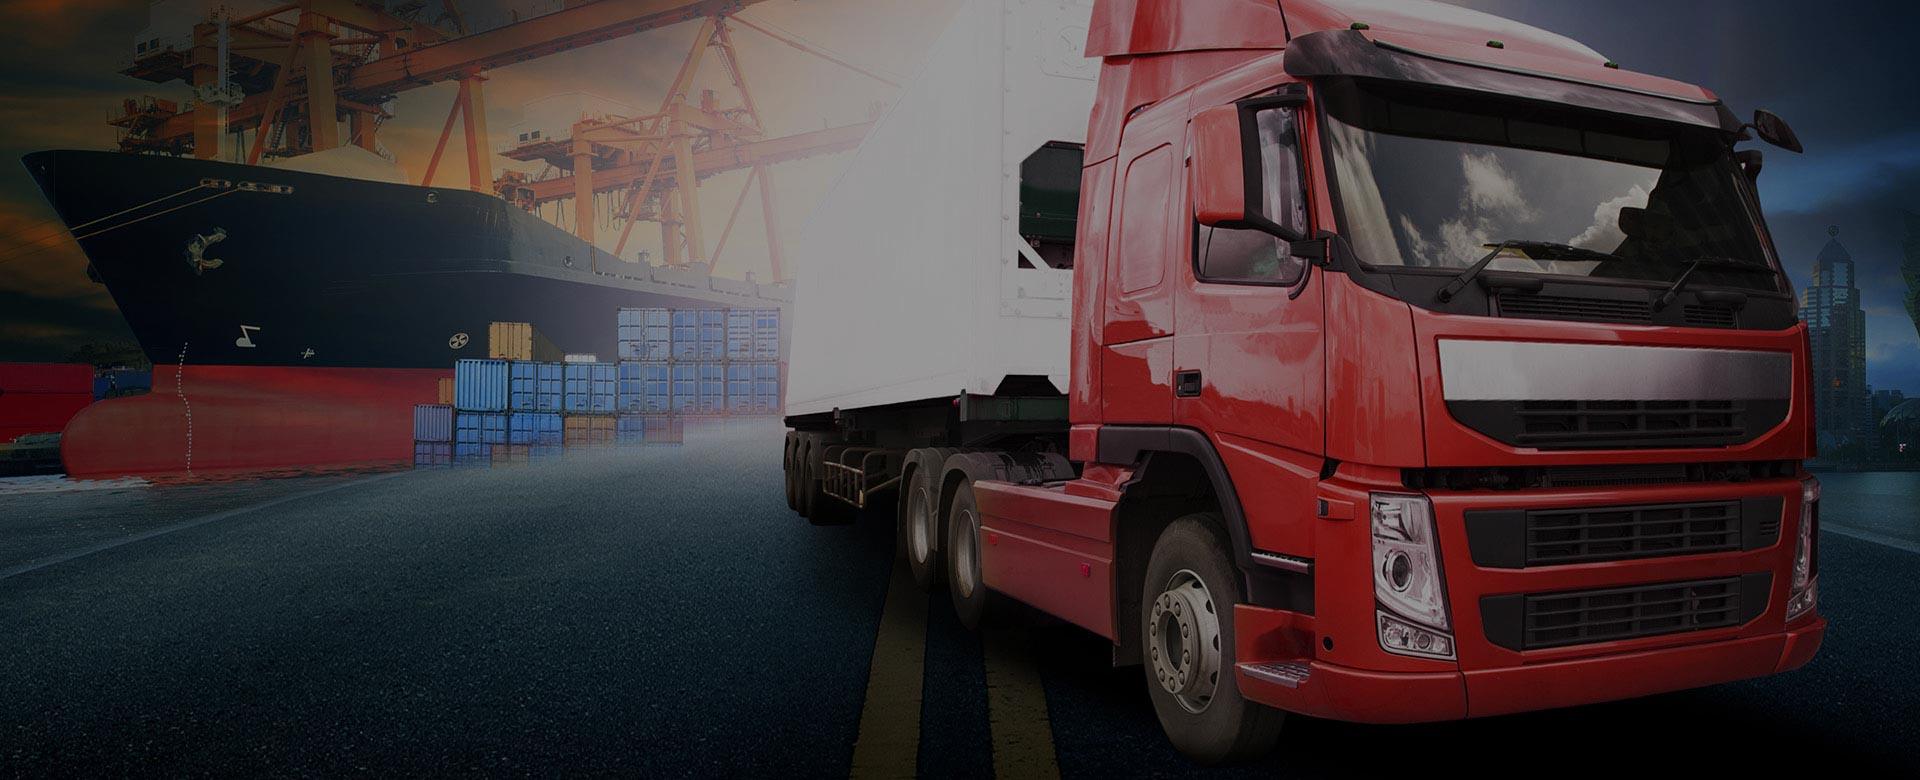 Local Transload Logistics Services - Transloading Services